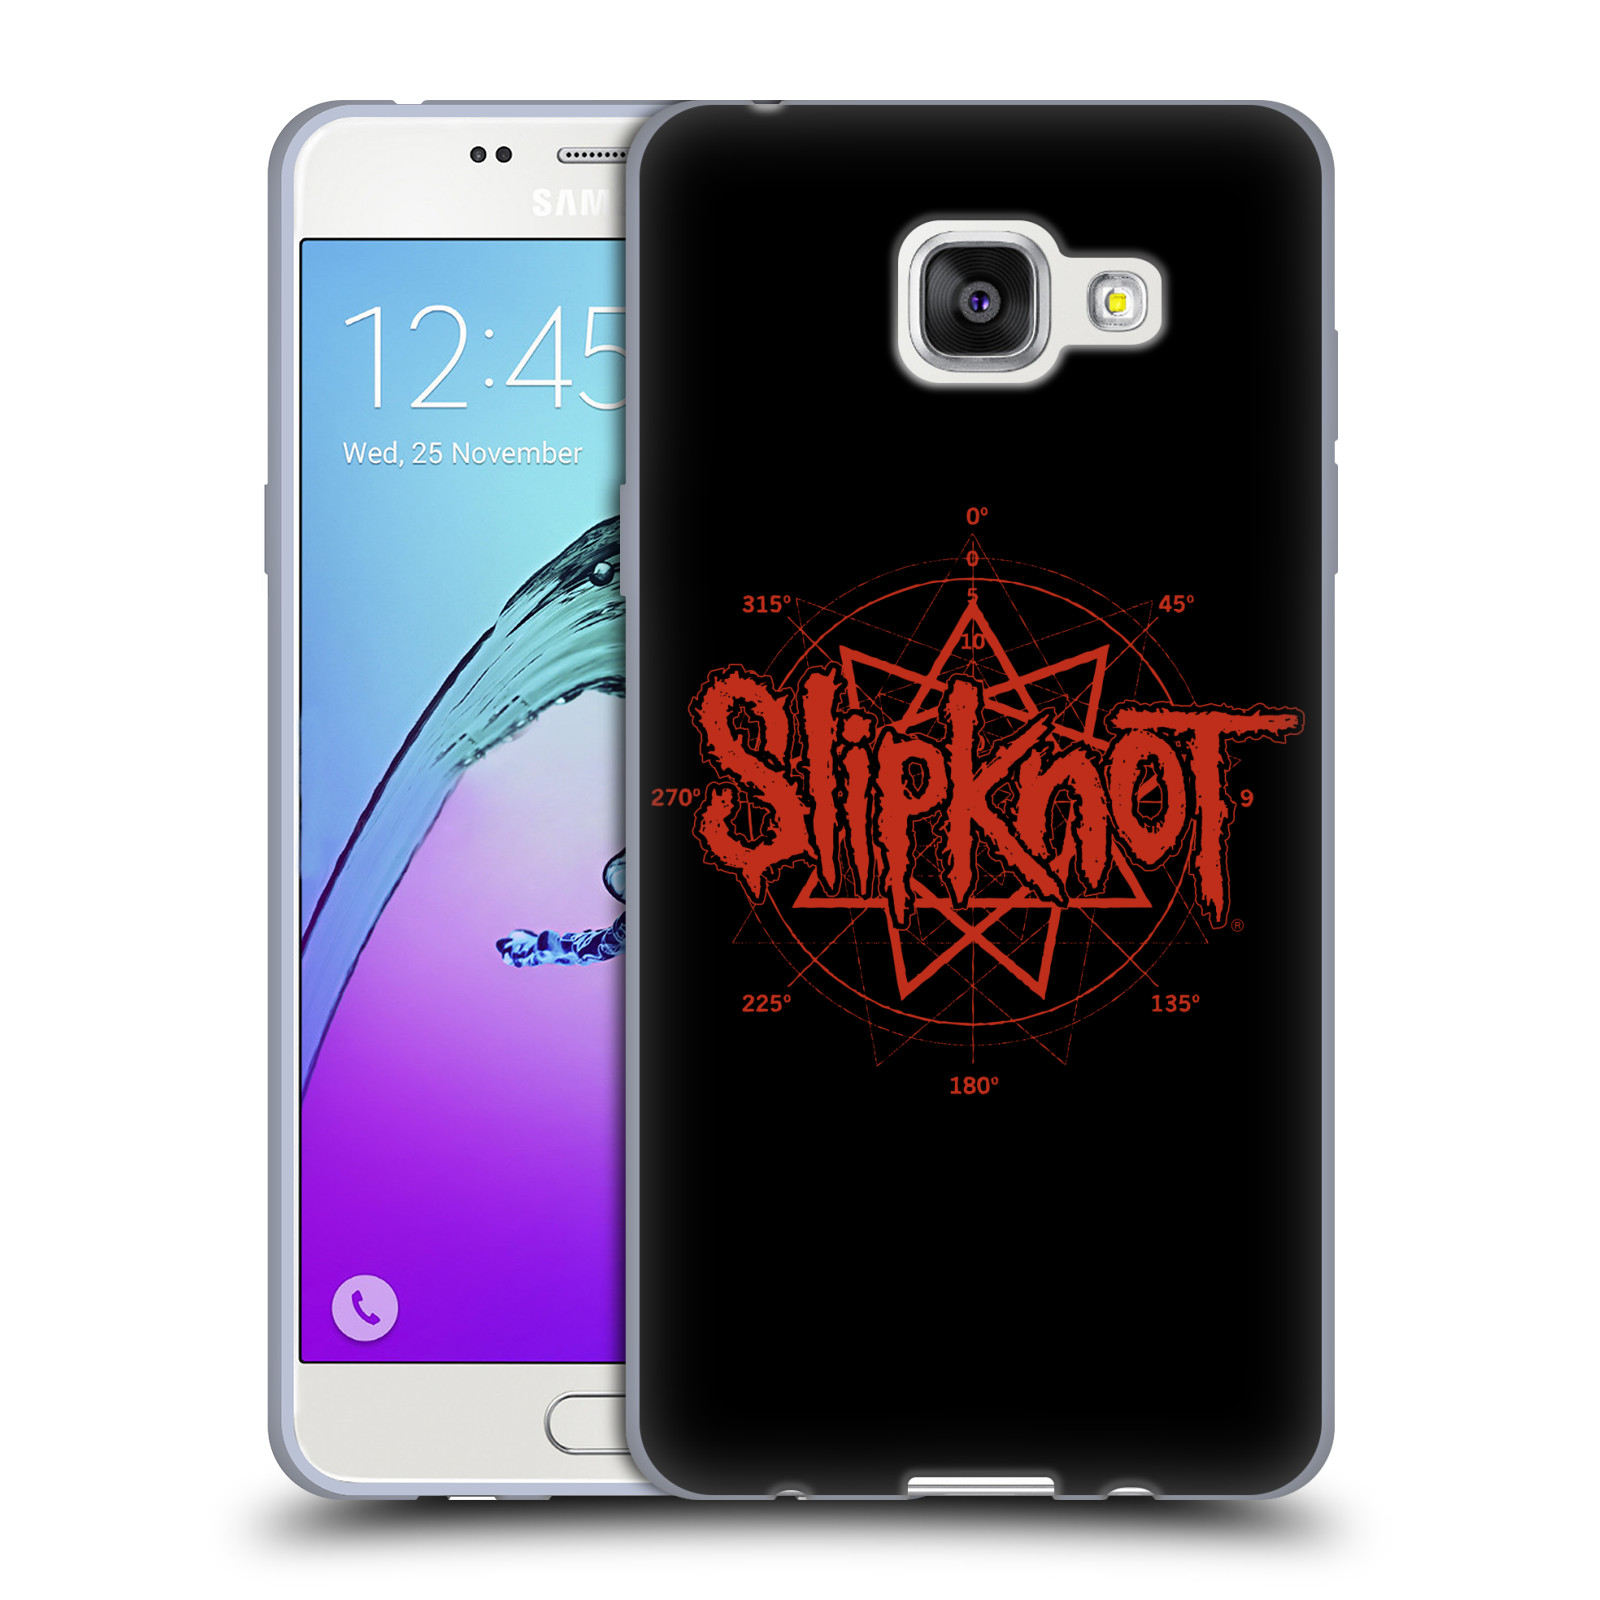 HEAD CASE silikonový obal na mobil Samsung Galaxy A5 2016 (A510) hudební skupina Slipknot logo